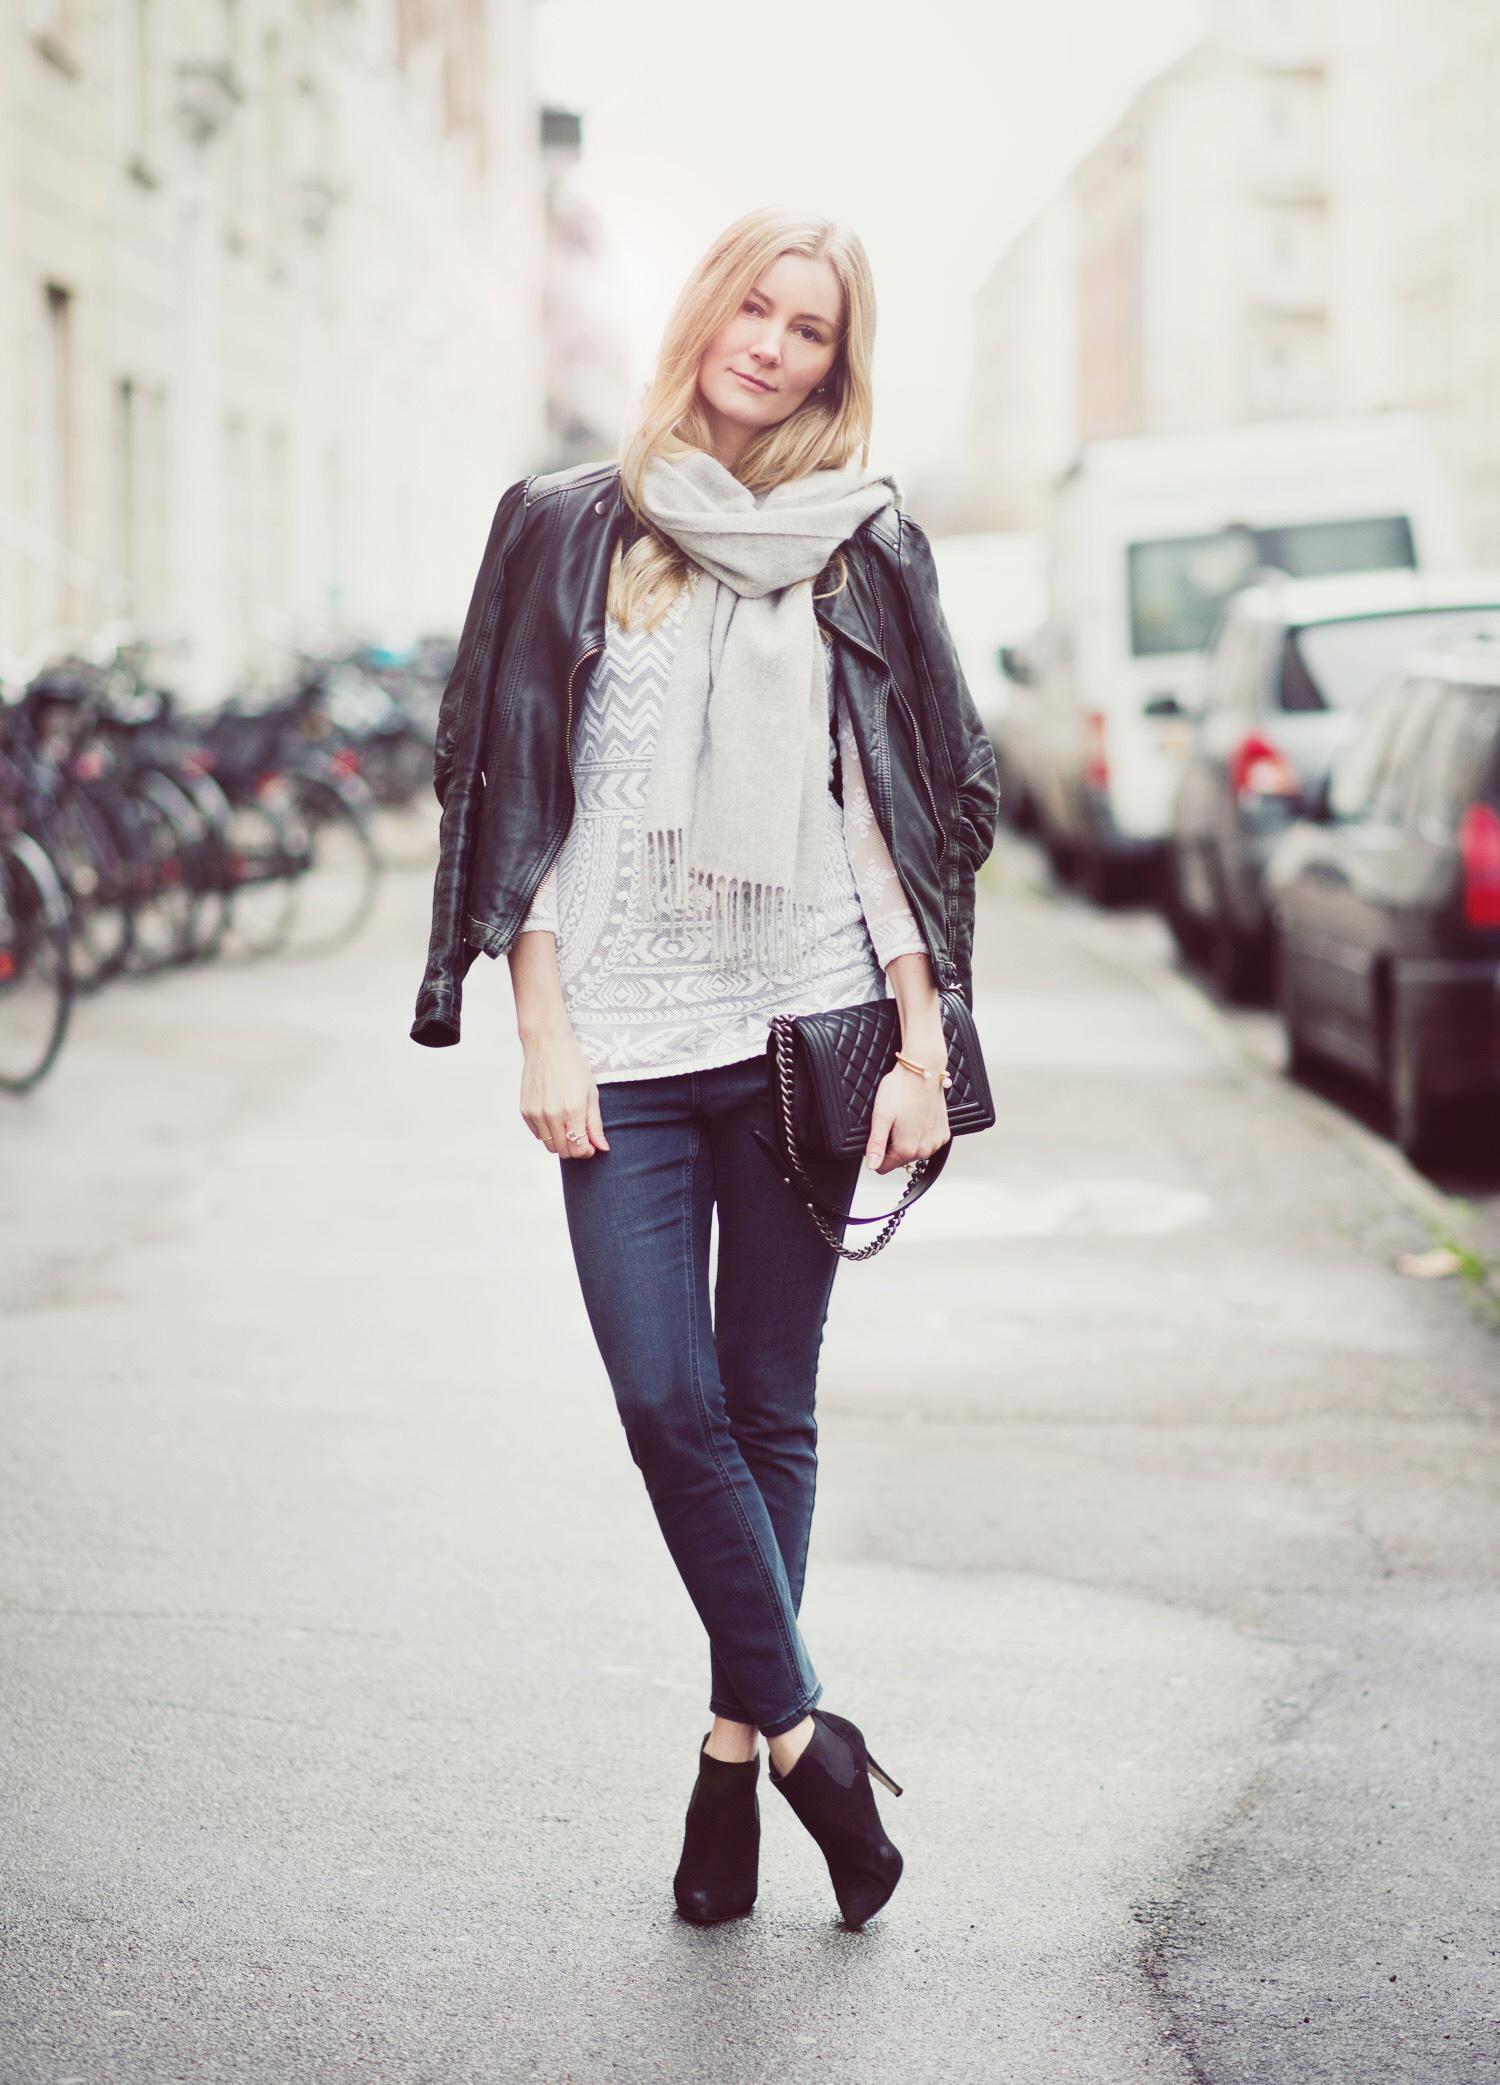 stramme-jeans@2x